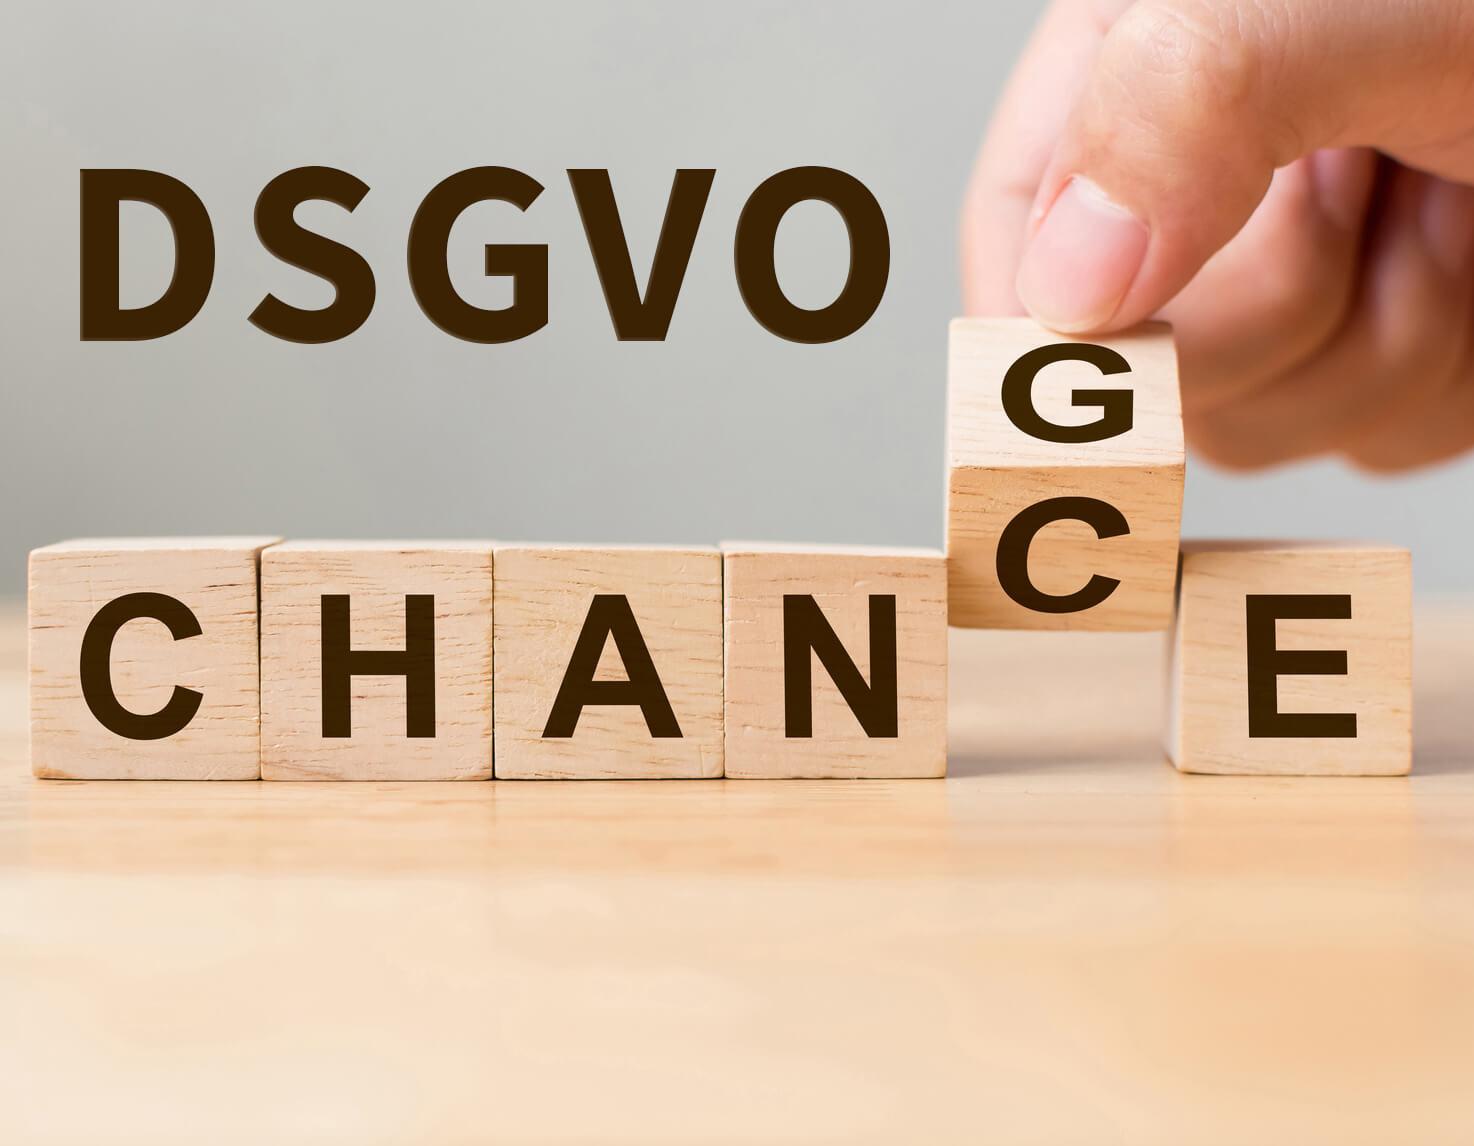 Chance DSGVO